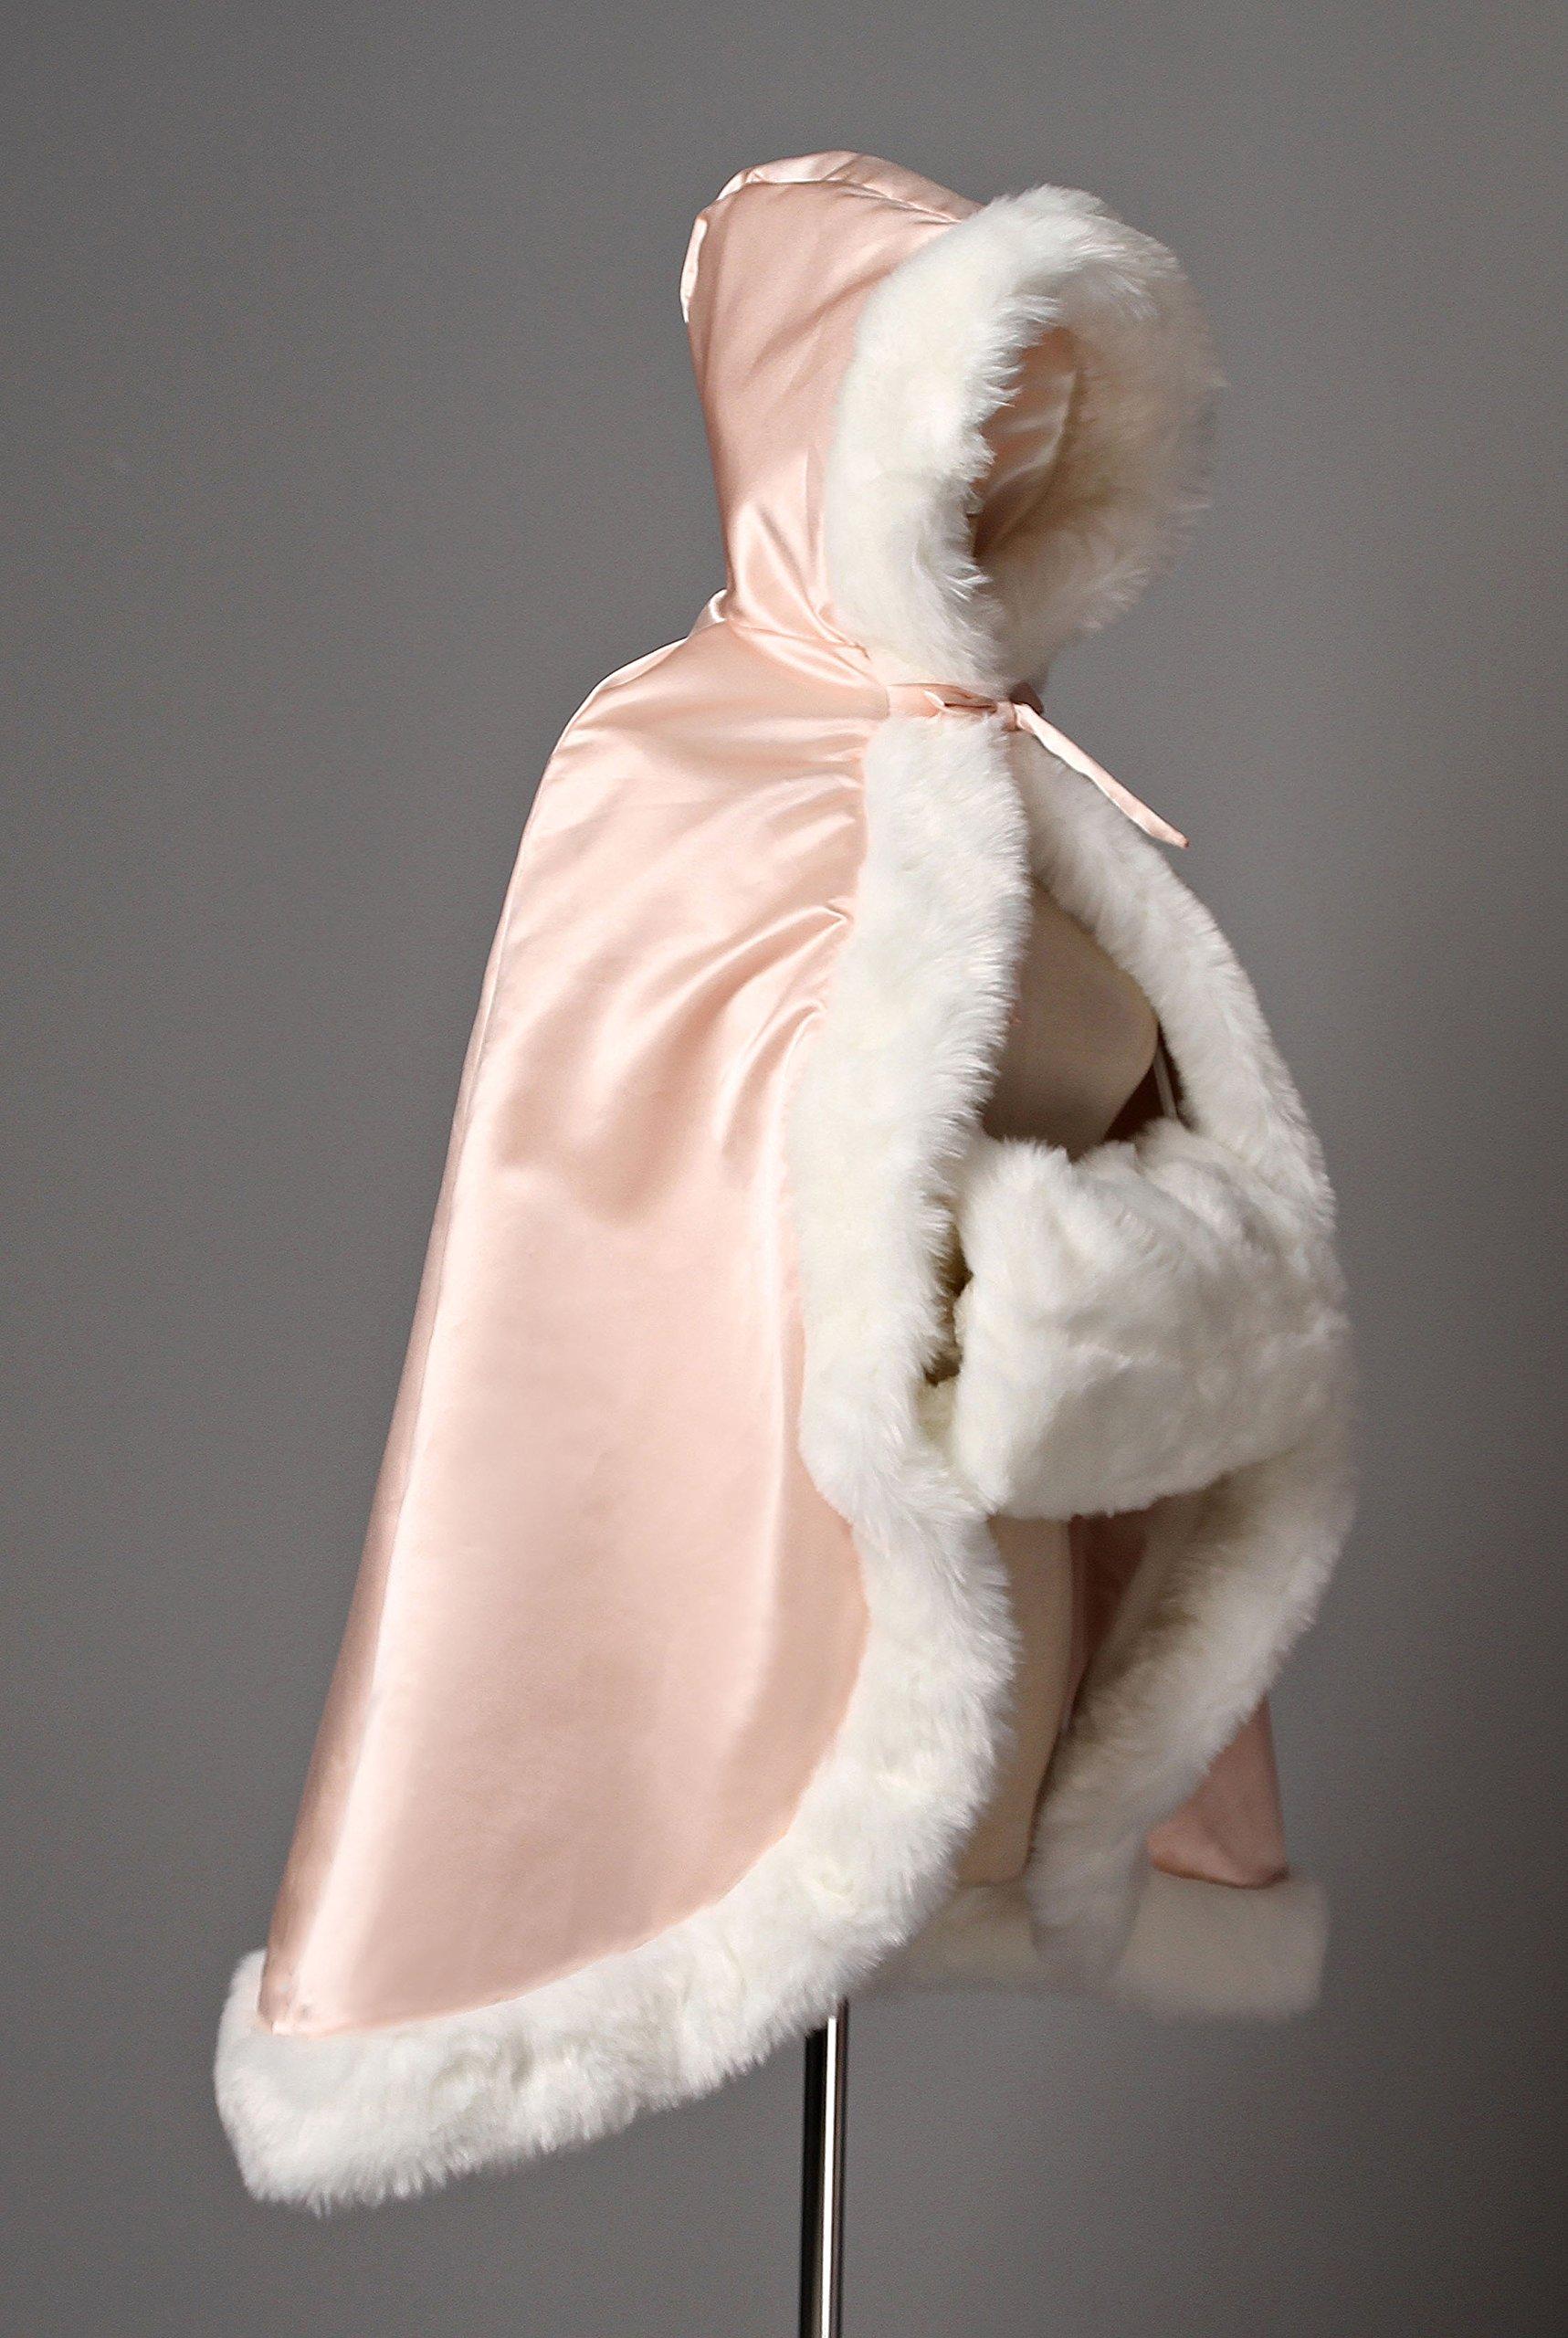 BEAUTELICATE Flower Girl Cape Winter Wedding Cloak for Infant Junior Bridesmaid Hooded Reversible Ivory 44 by BEAUTELICATE (Image #7)